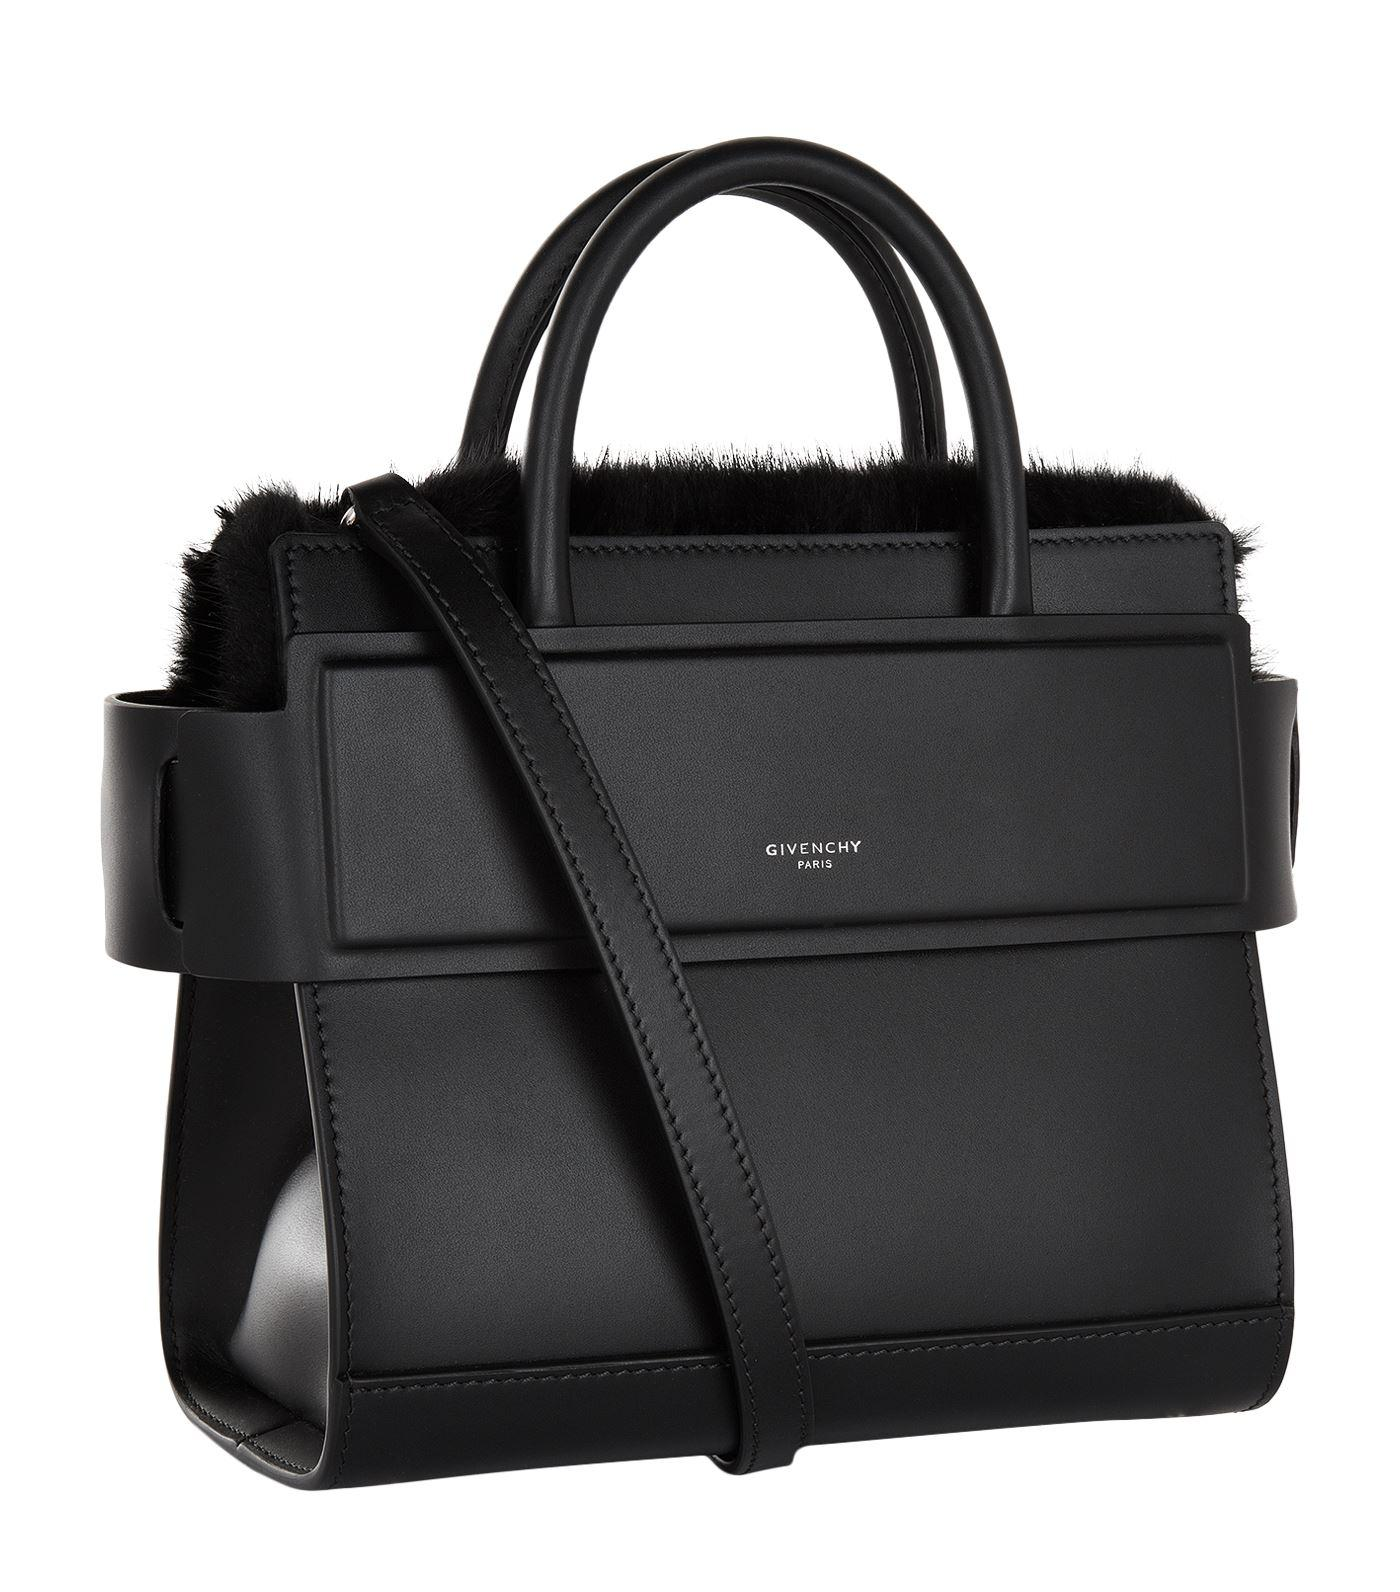 29295650c23 Lyst - Givenchy Mini Horizon Mink Trim Tote Bag in Black